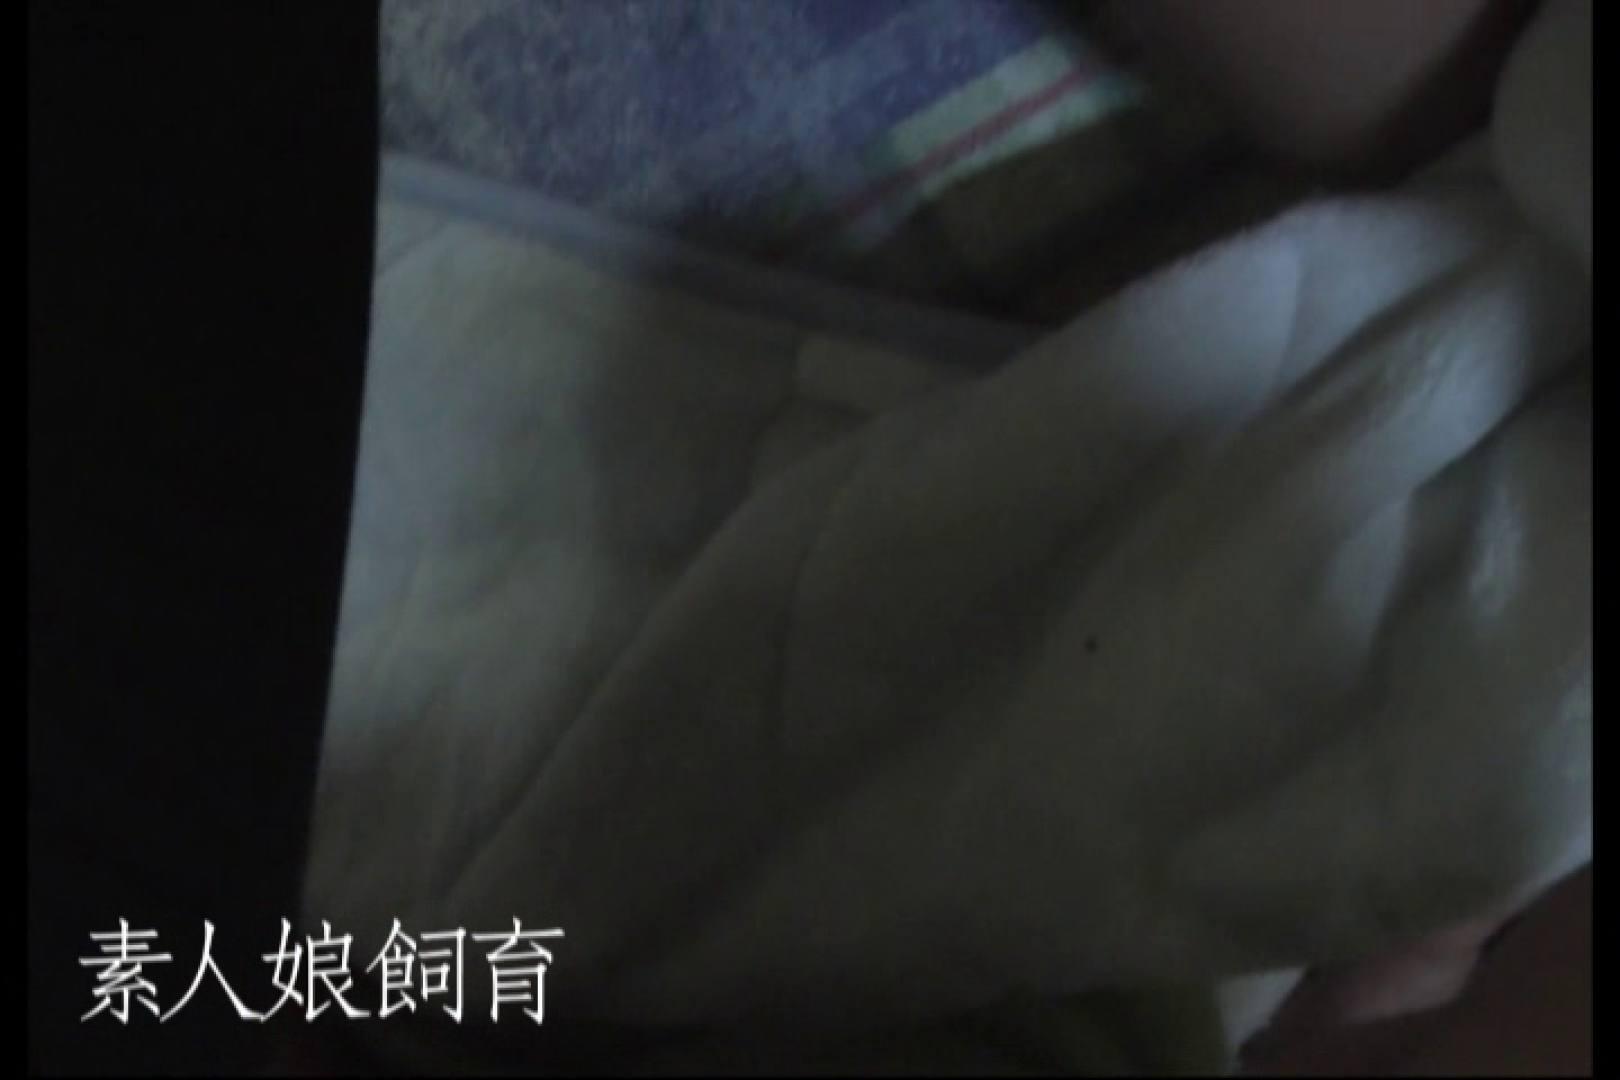 素人娘飼育~お前の餌は他人棒~鬼畜輪●中編 一般投稿 盗撮動画紹介 106pic 93